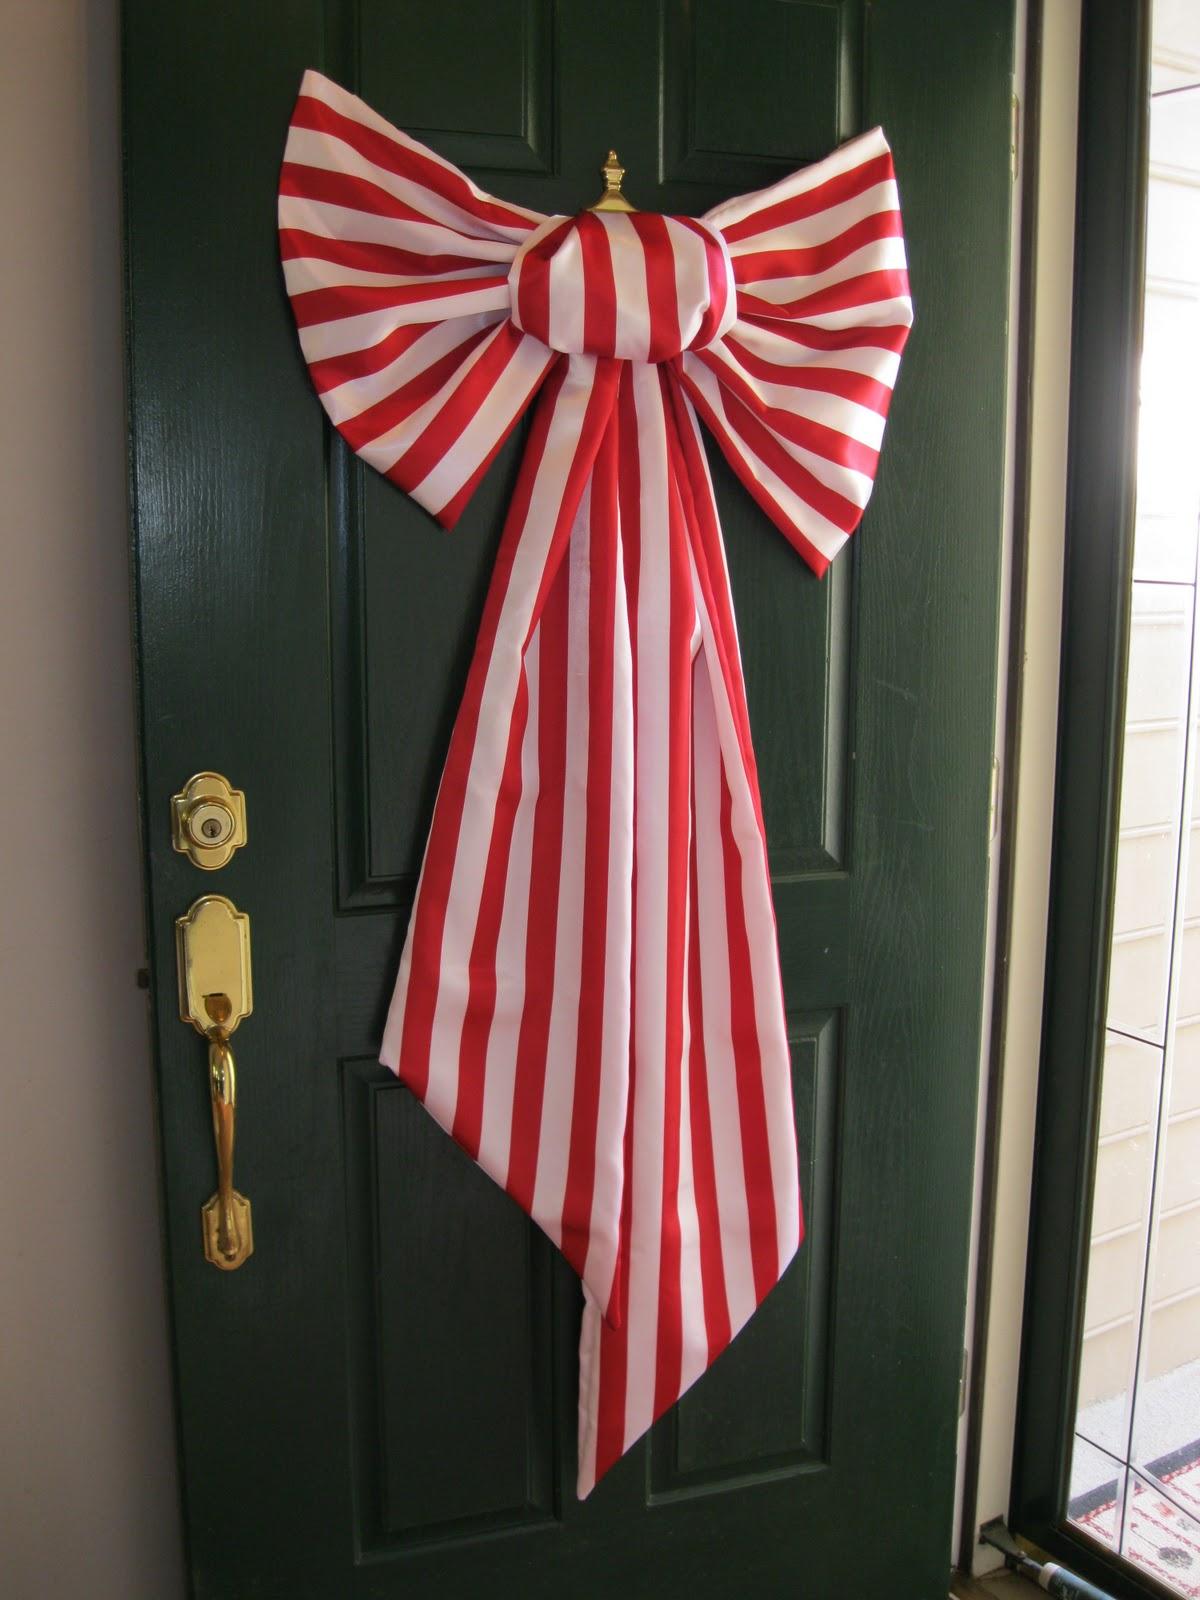 how to make a big bow - How To Make A Big Christmas Bow